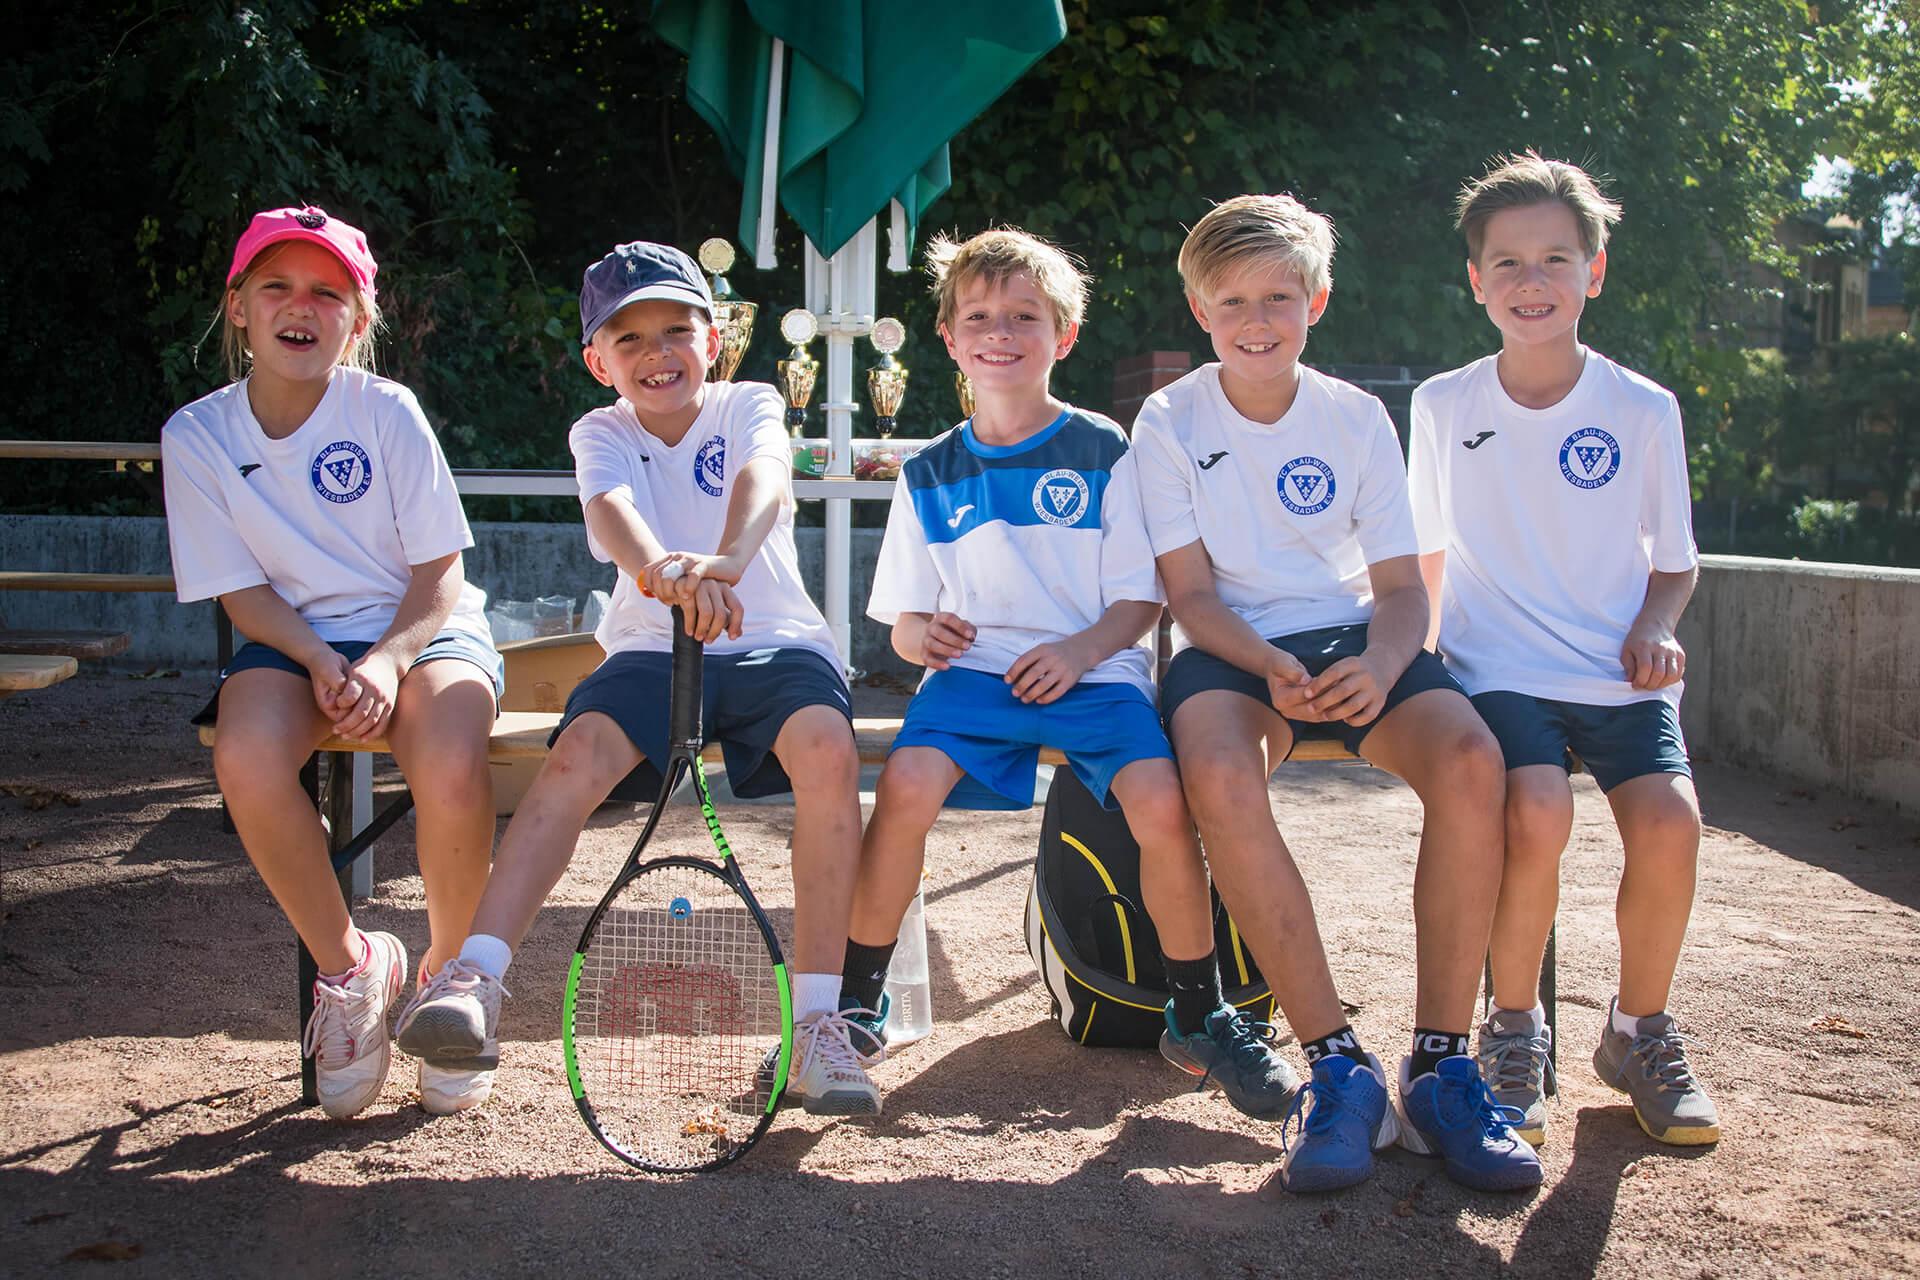 https://tcbw-wiesbaden.de/wp-content/uploads/2021/02/Tennis-Kids.jpg